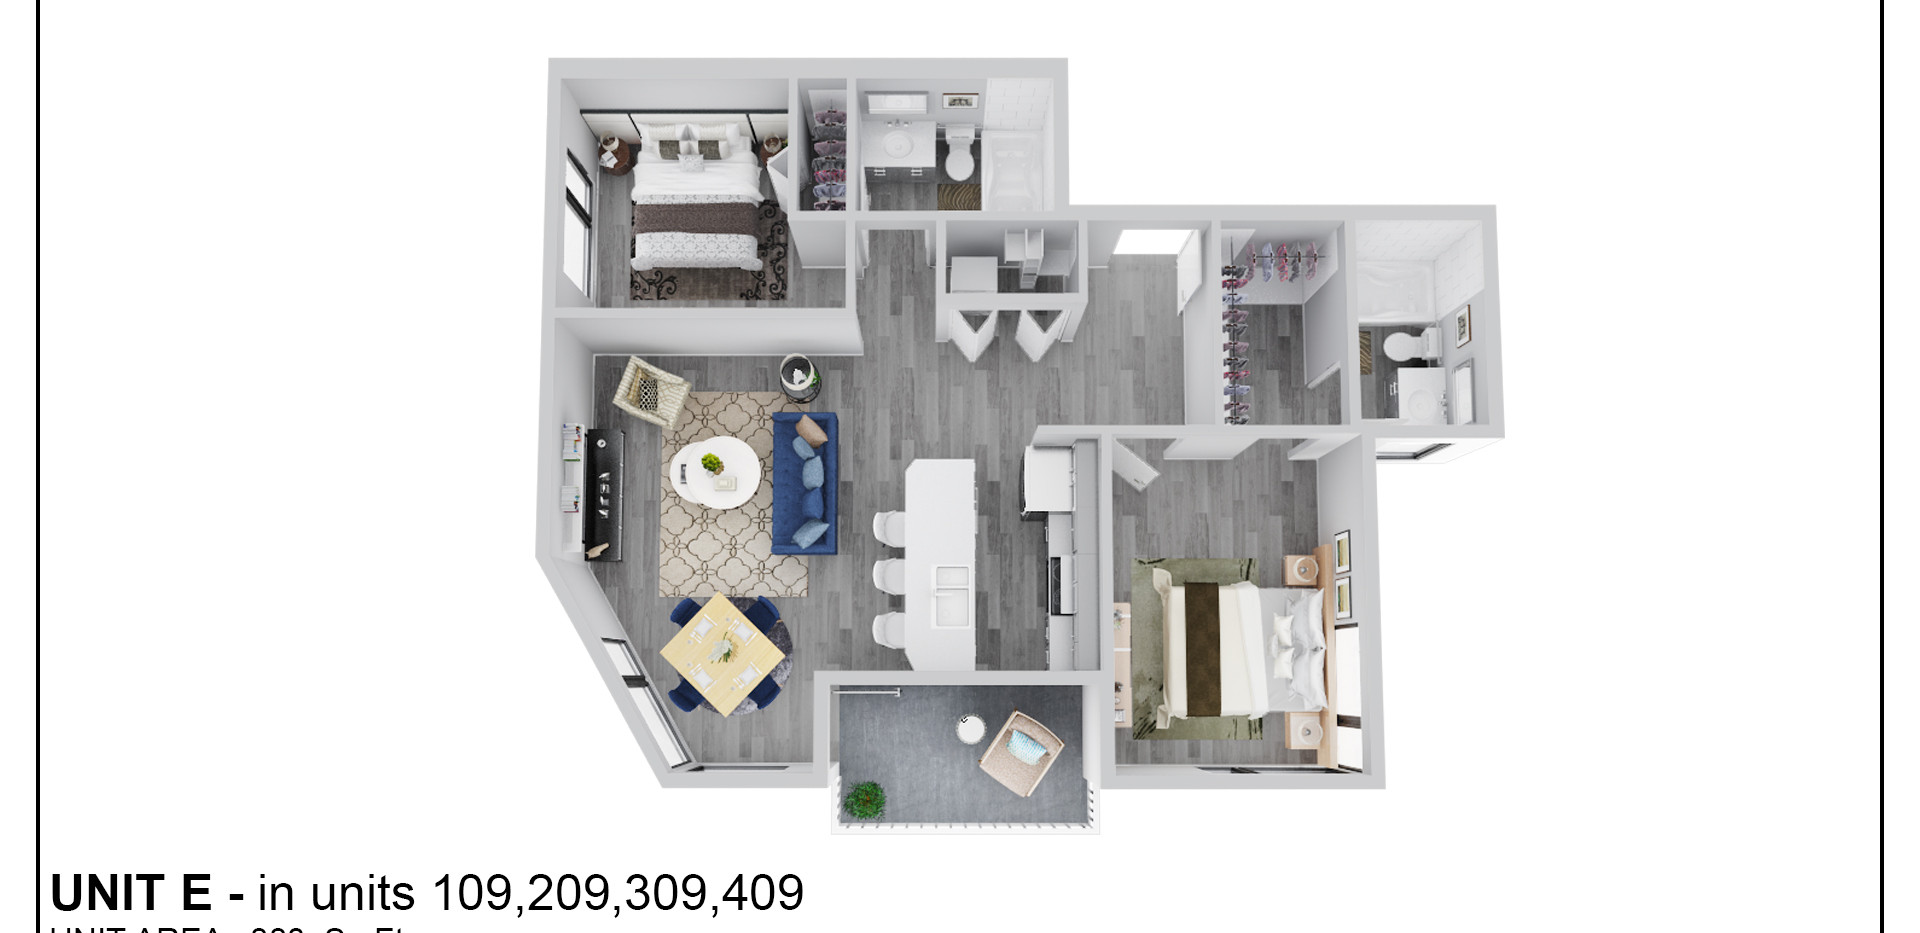 Floor Two - Unit E - 209